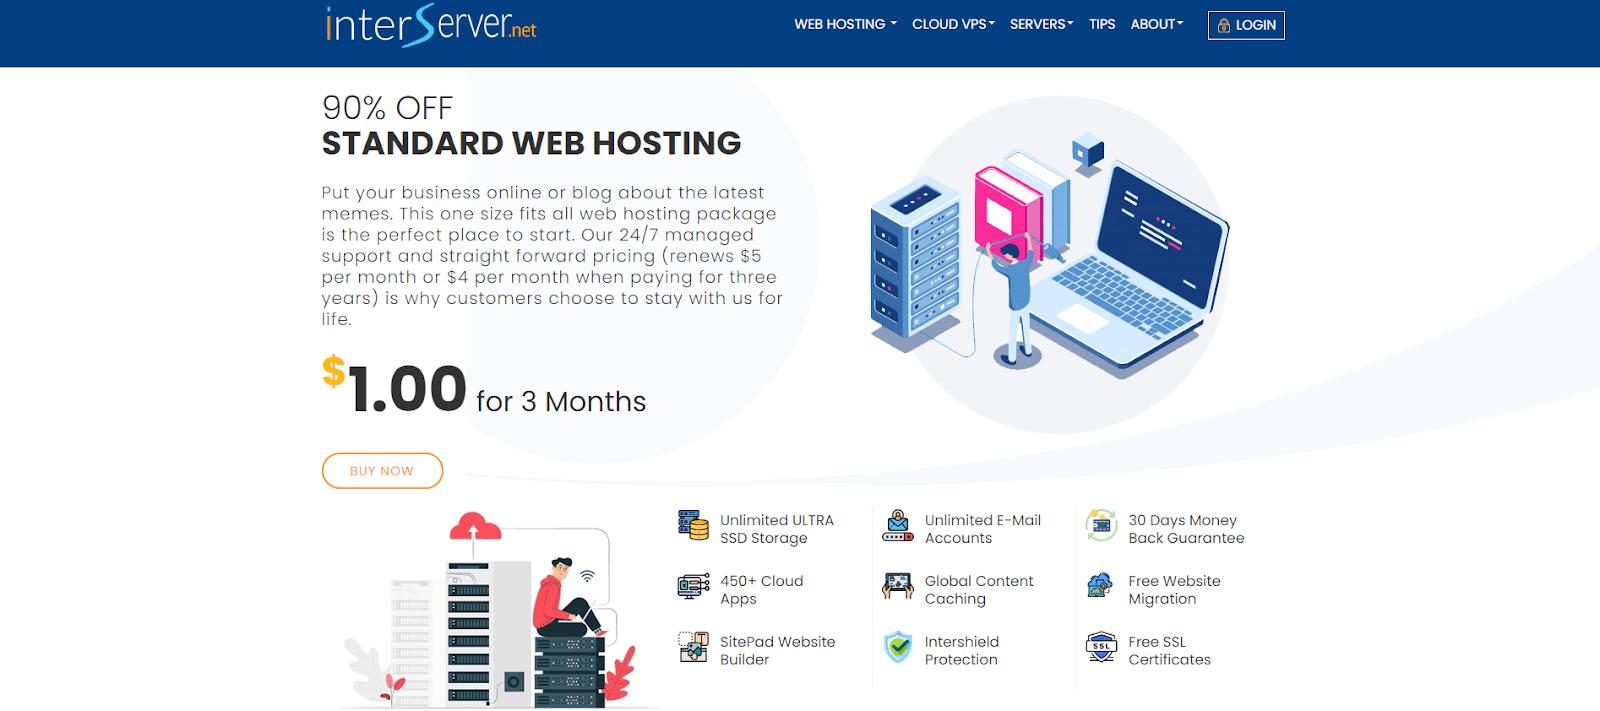 Interserver web host